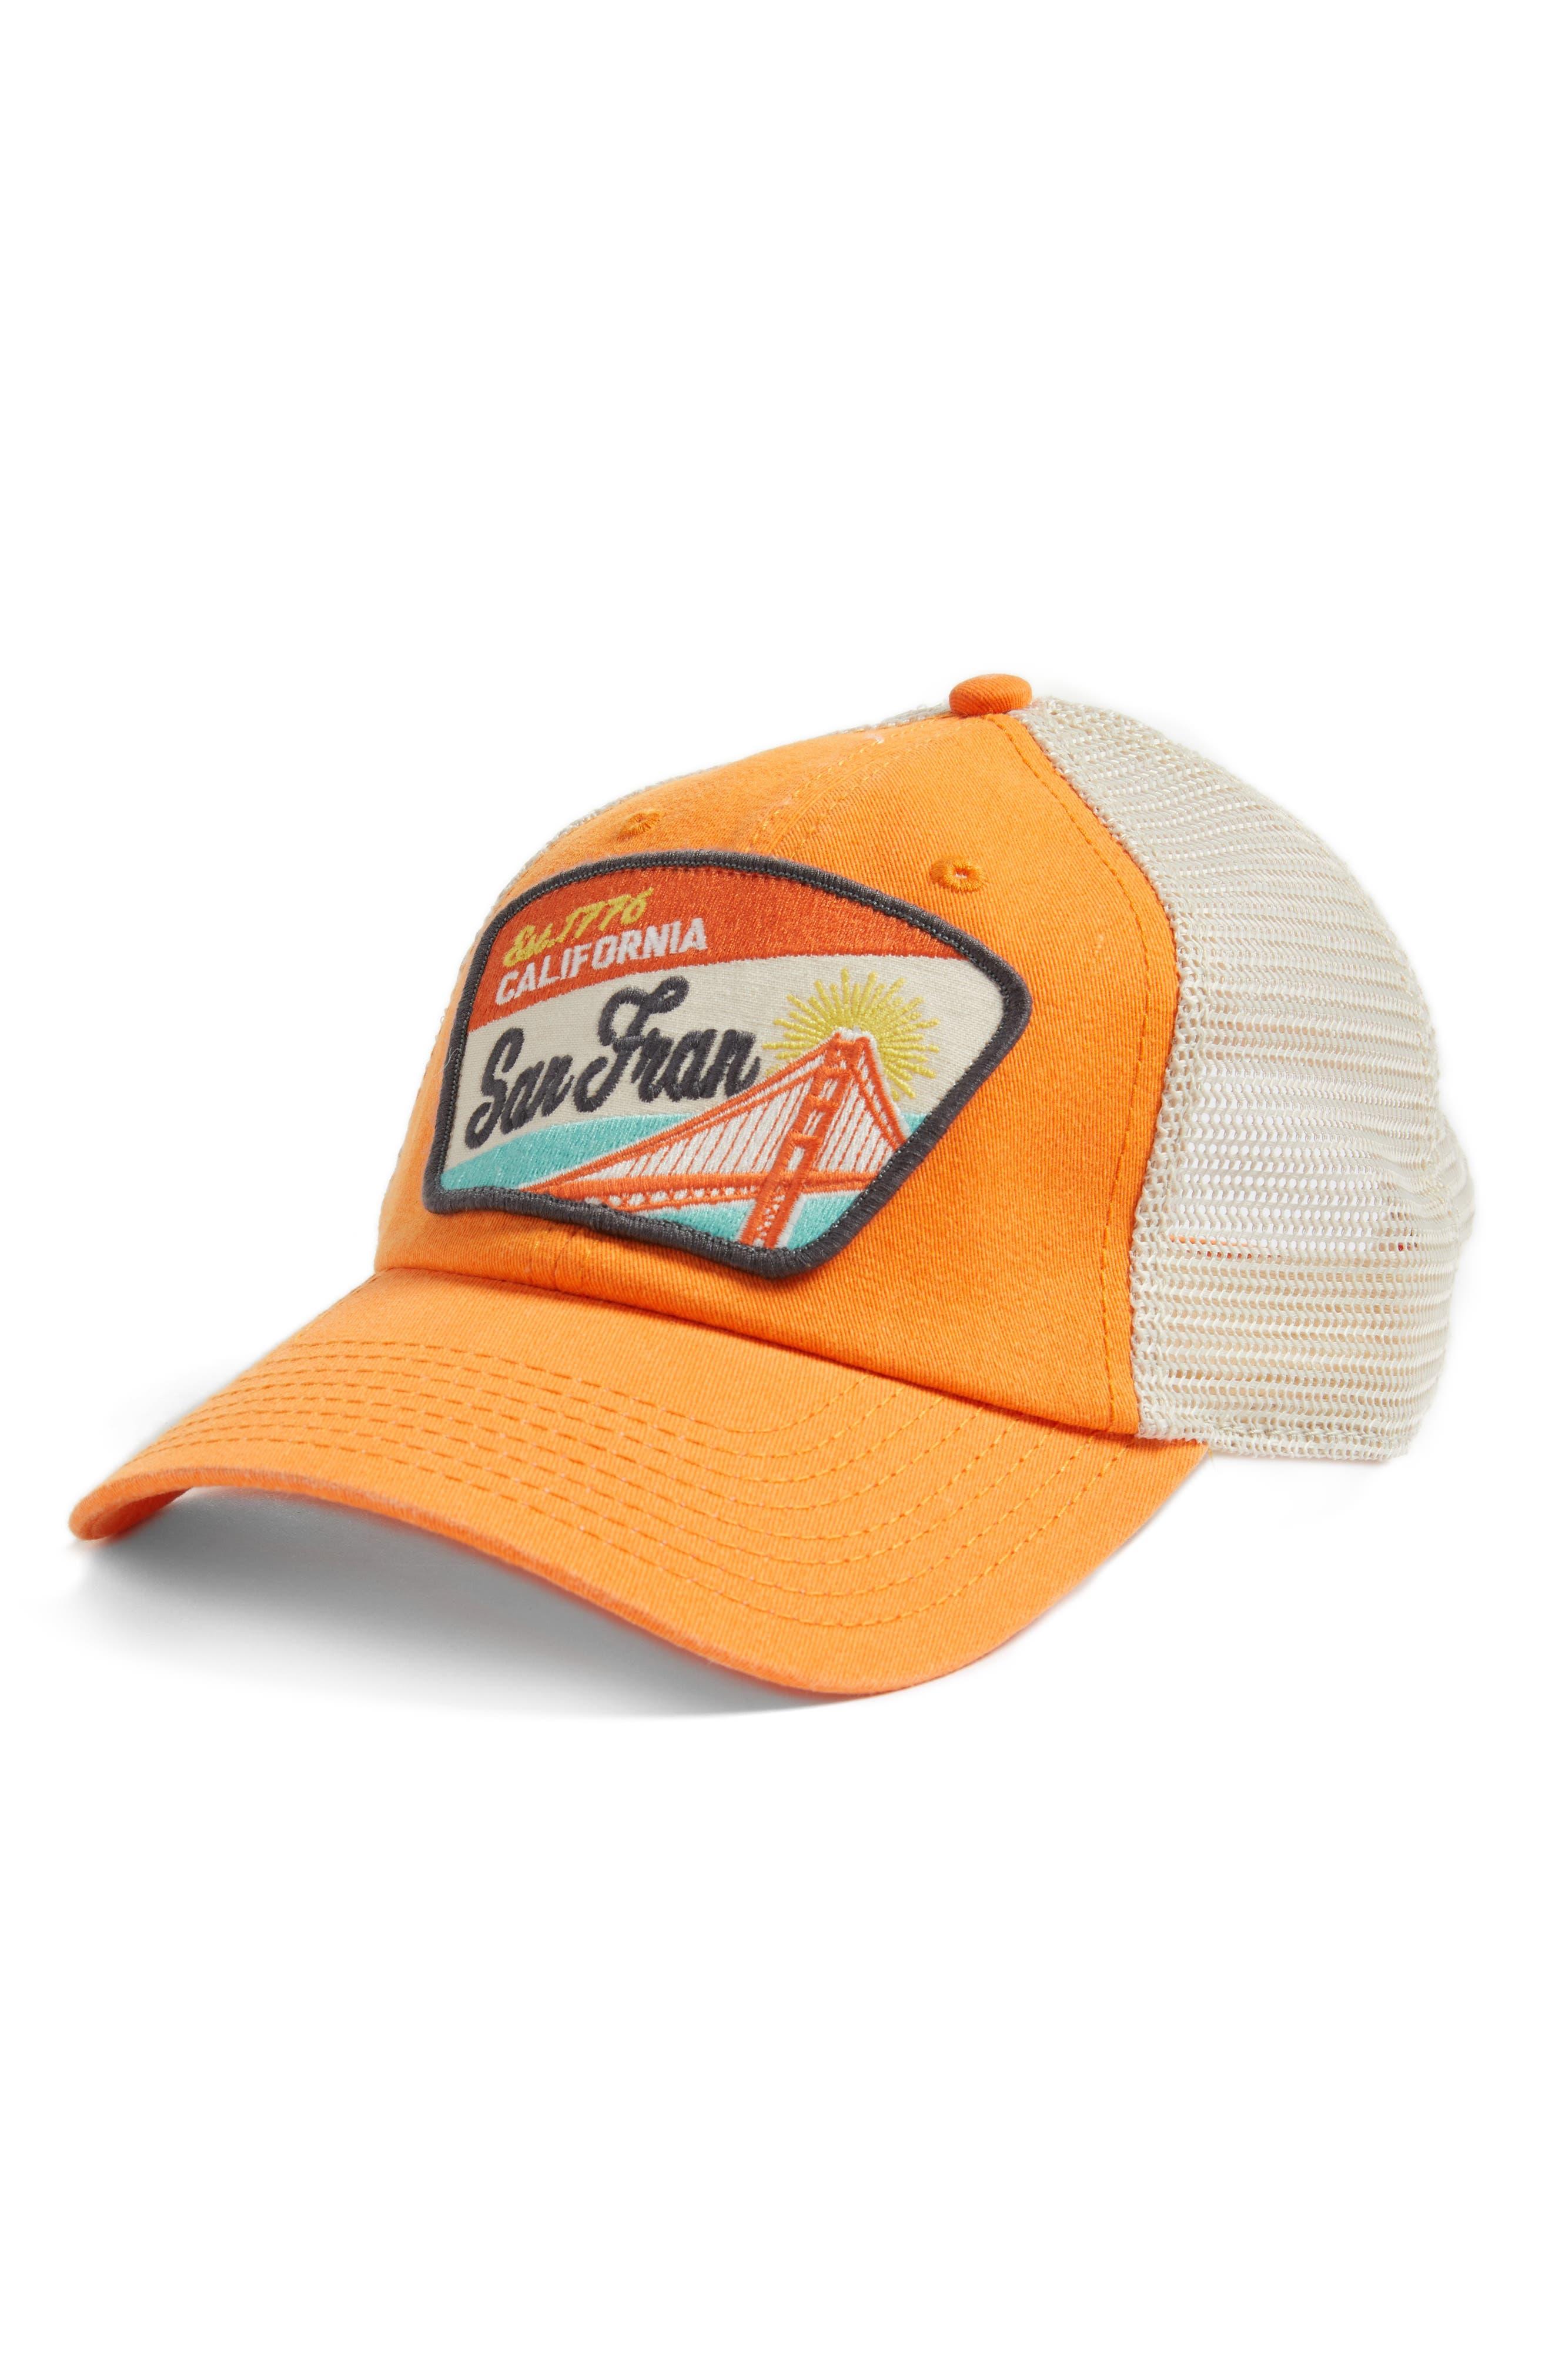 Ravenswood - Destination San Francisco Hat,                             Main thumbnail 1, color,                             Ivory/ Orange